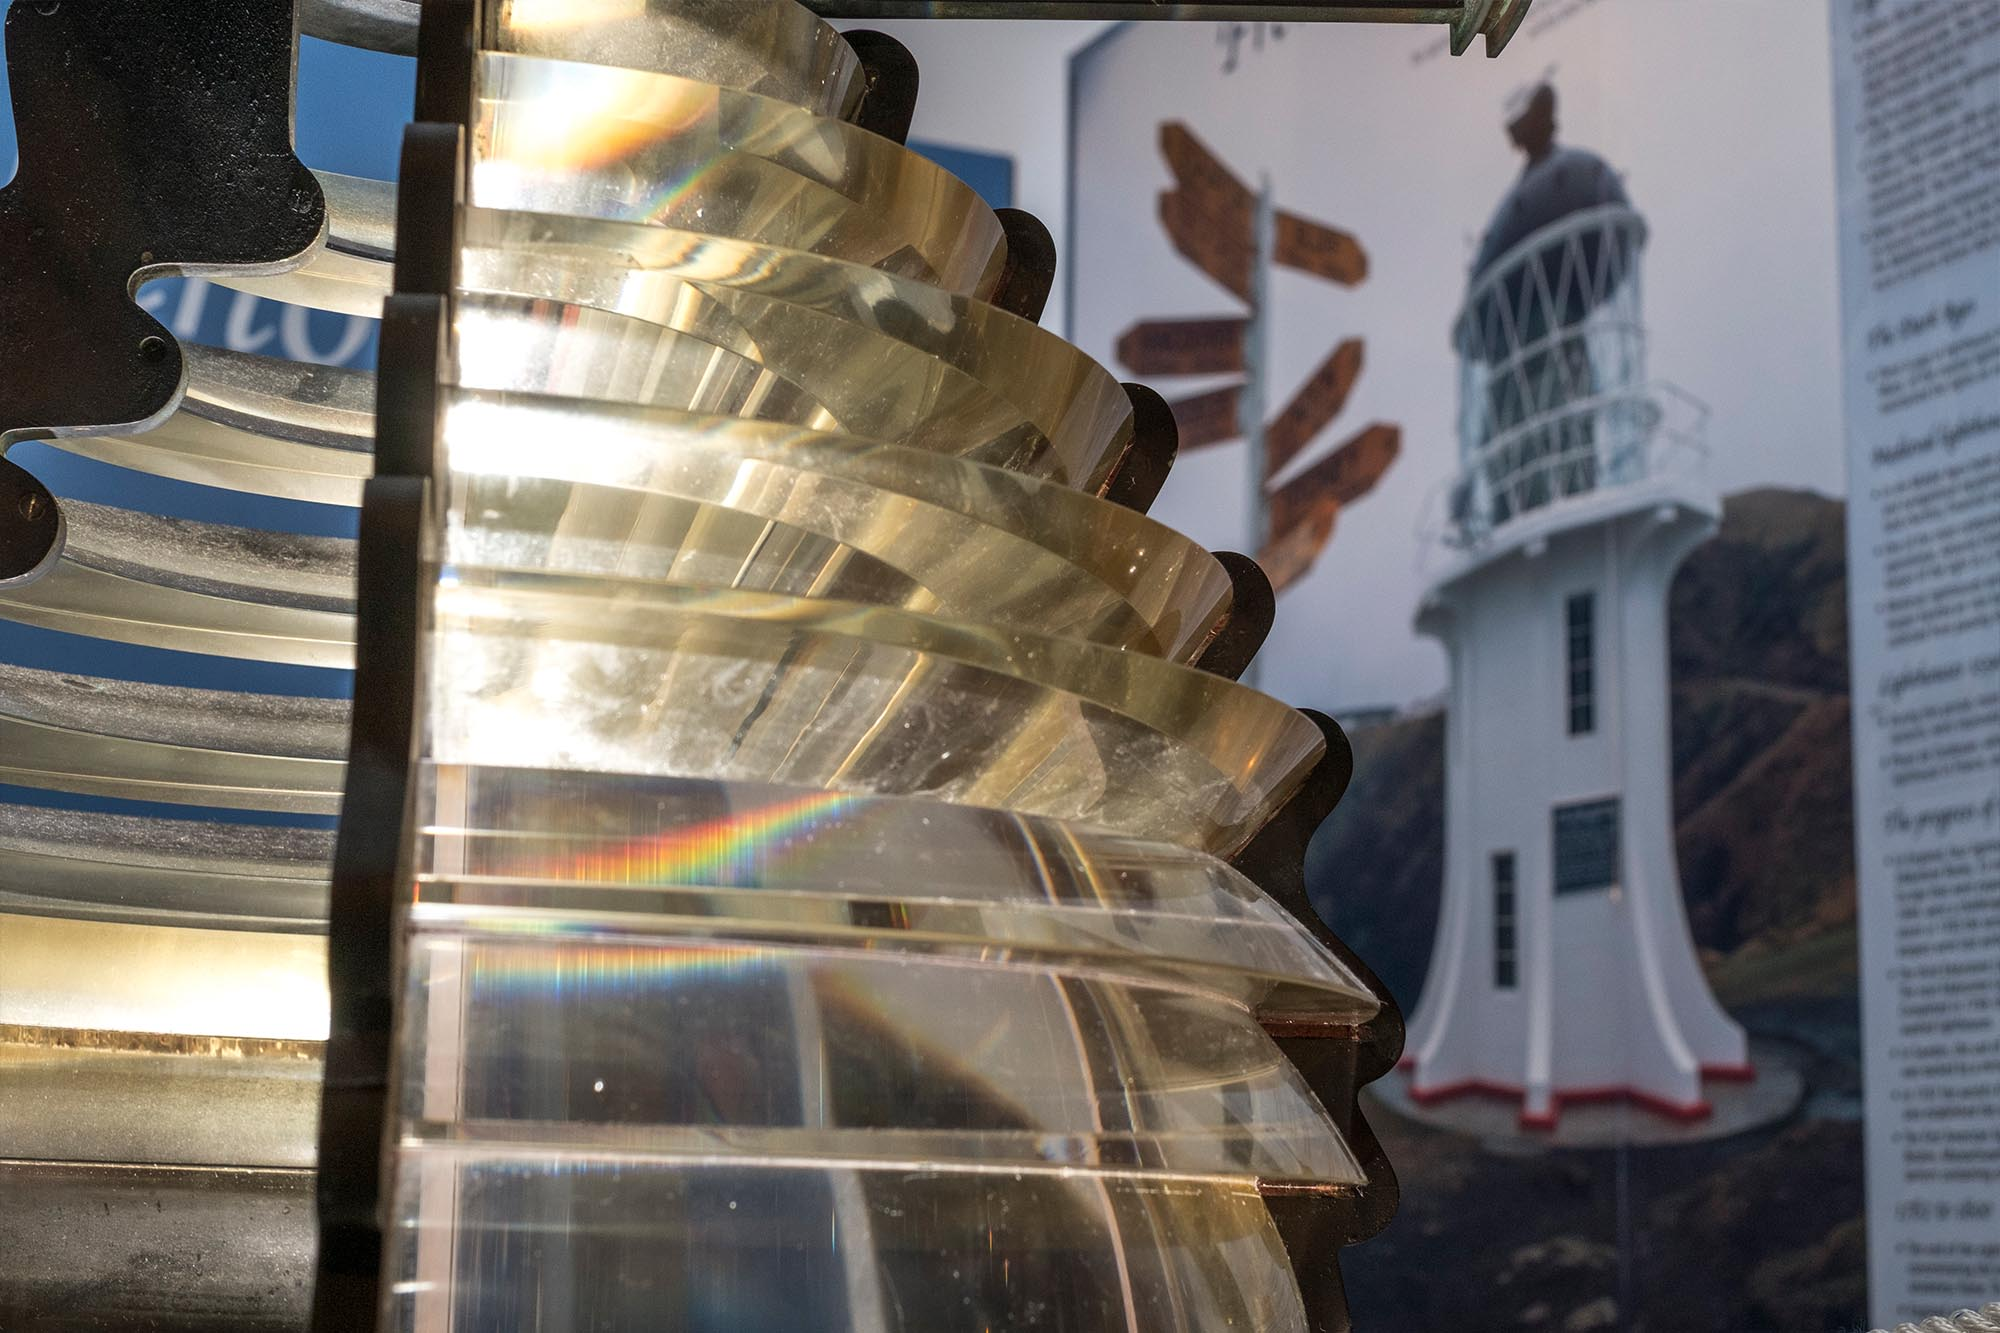 https://rfacdn.nz/maritime/assets/media/kiwis-and-the-coast-lighthouse-carousel.jpg